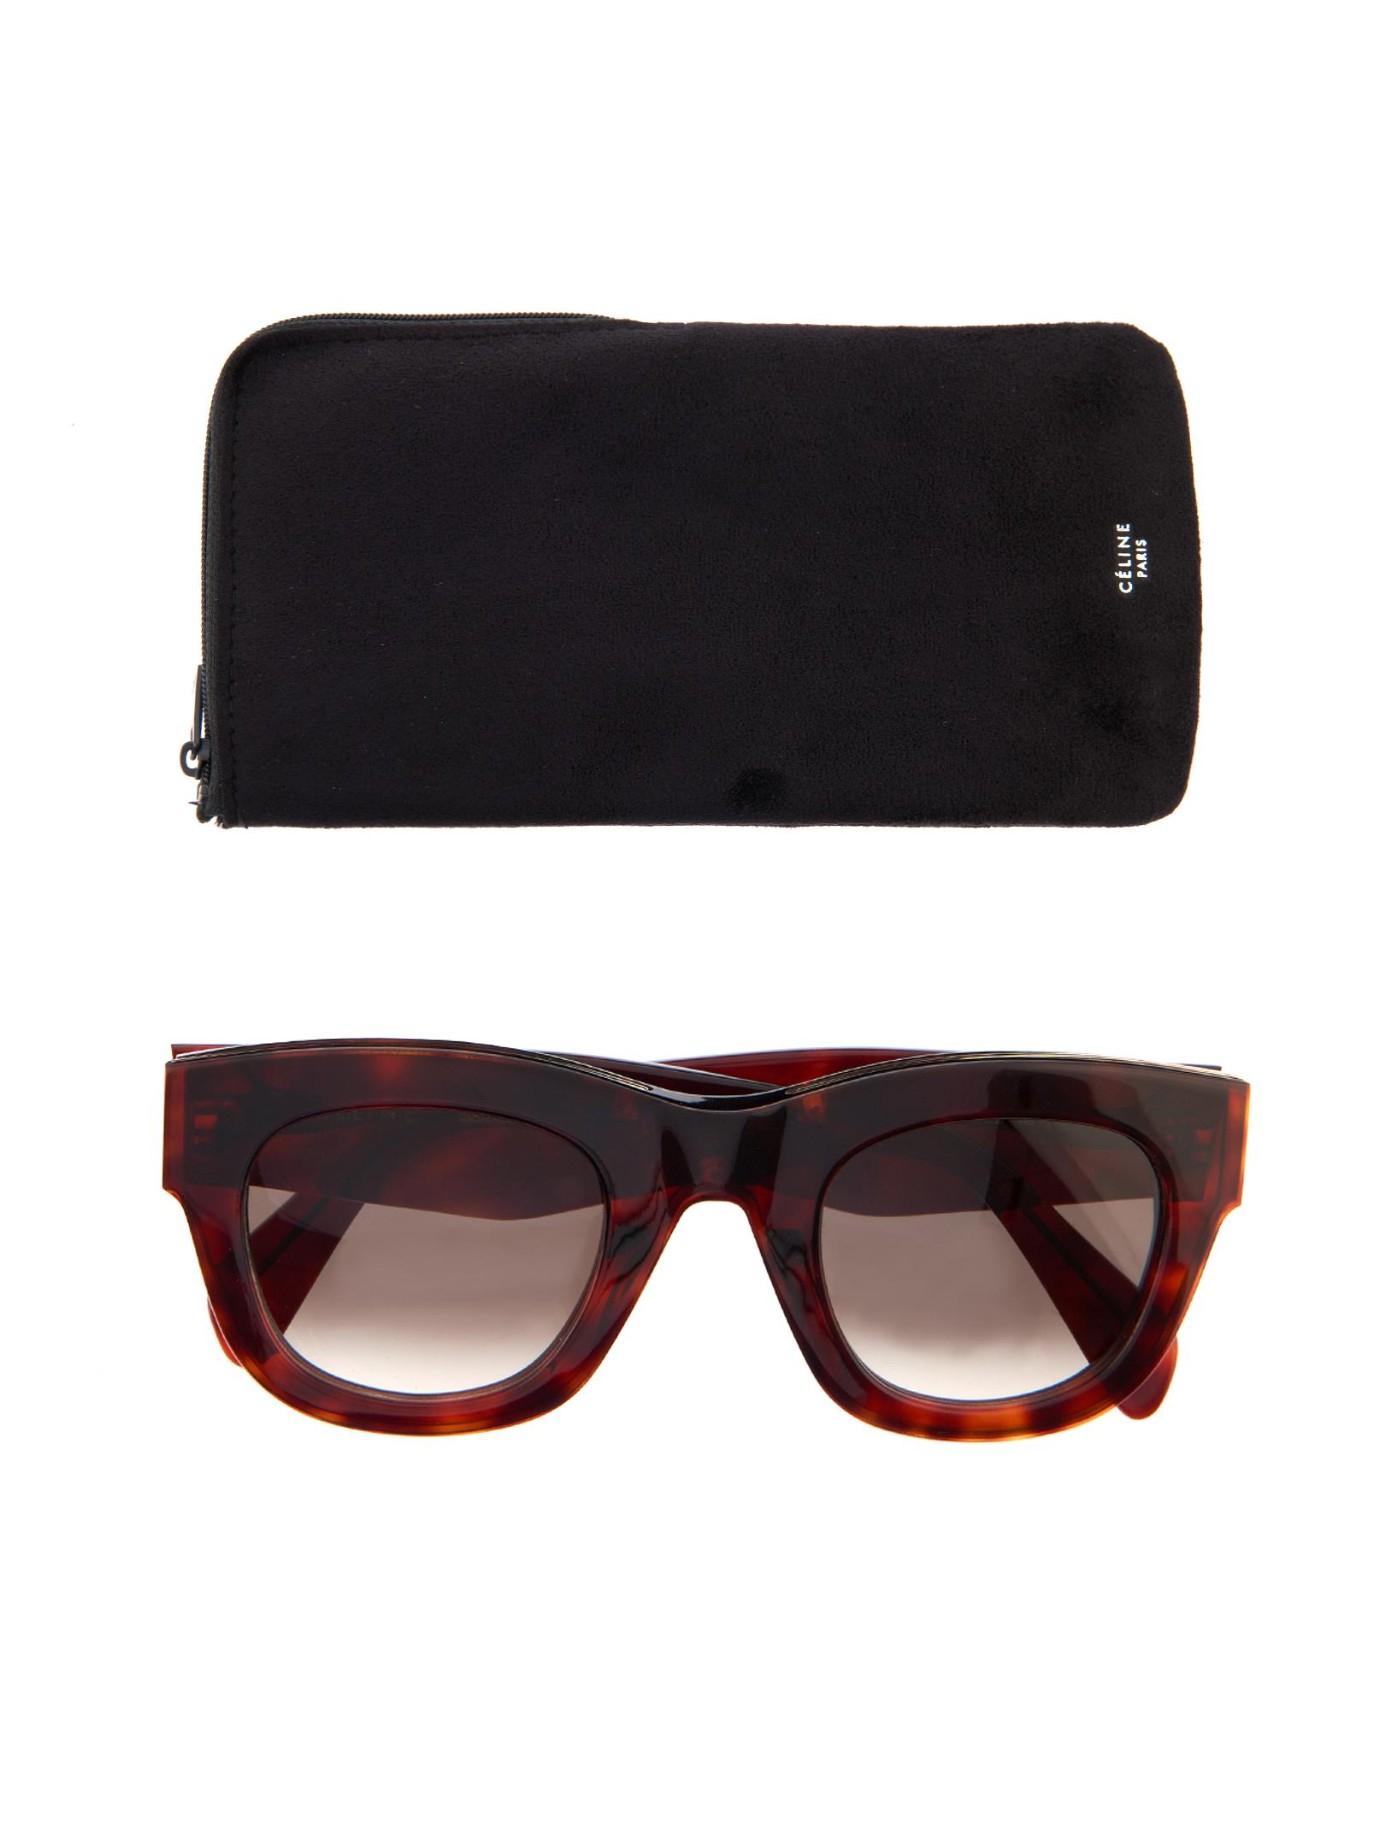 Lyst - Céline D-Frame Acetate Sunglasses in Purple